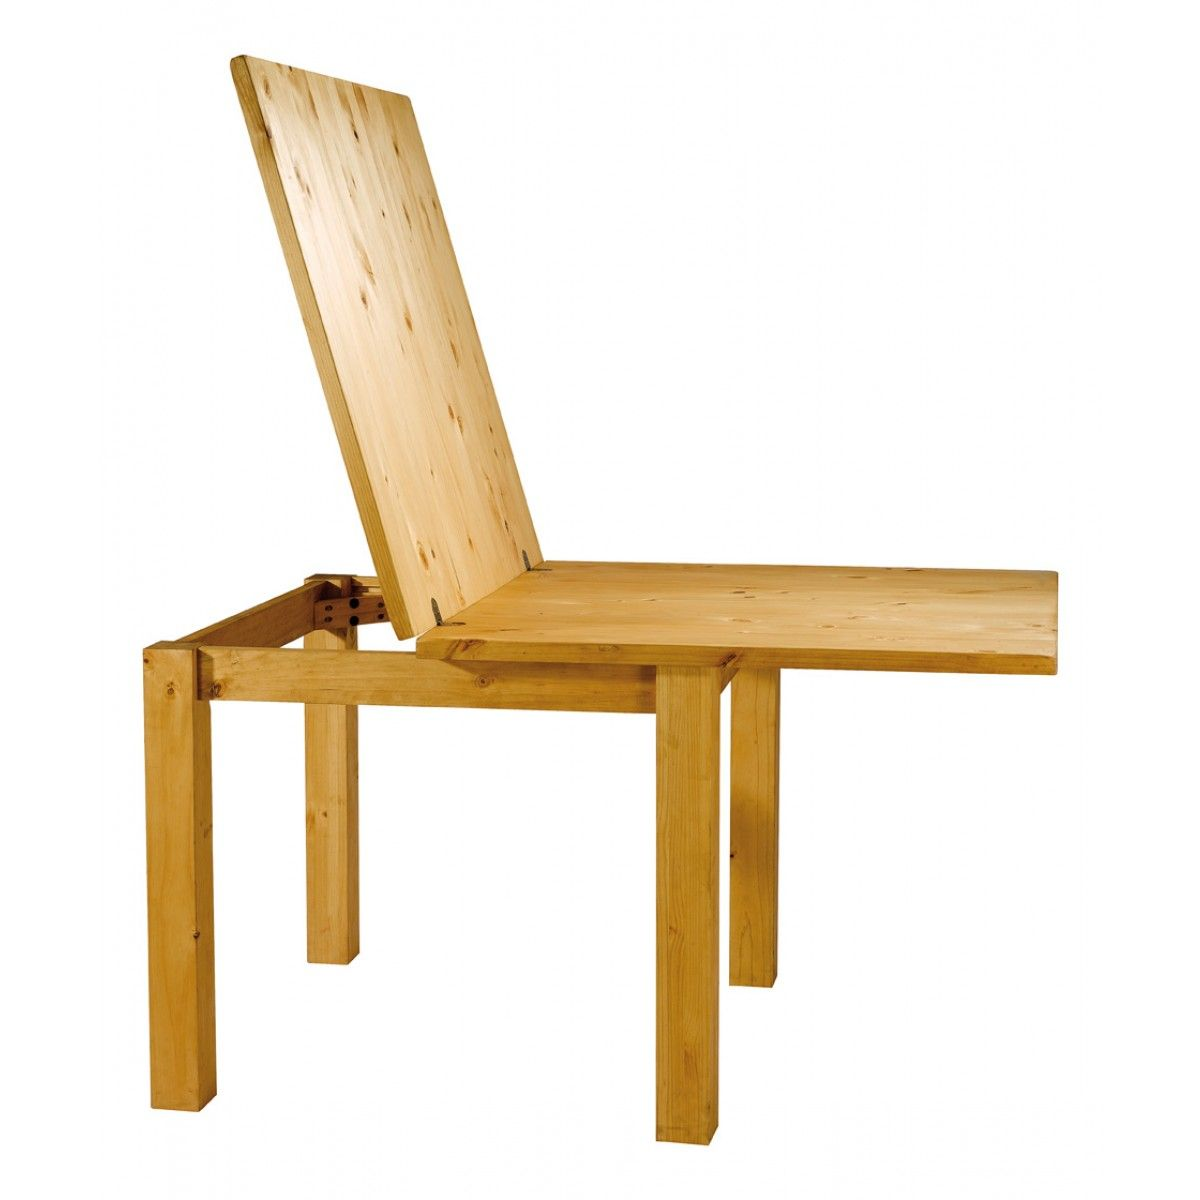 Table carr e en pin 90 cm avec rallonge 90 cm soldes grenier alpin decoration pinterest - Tables carrees avec rallonge ...